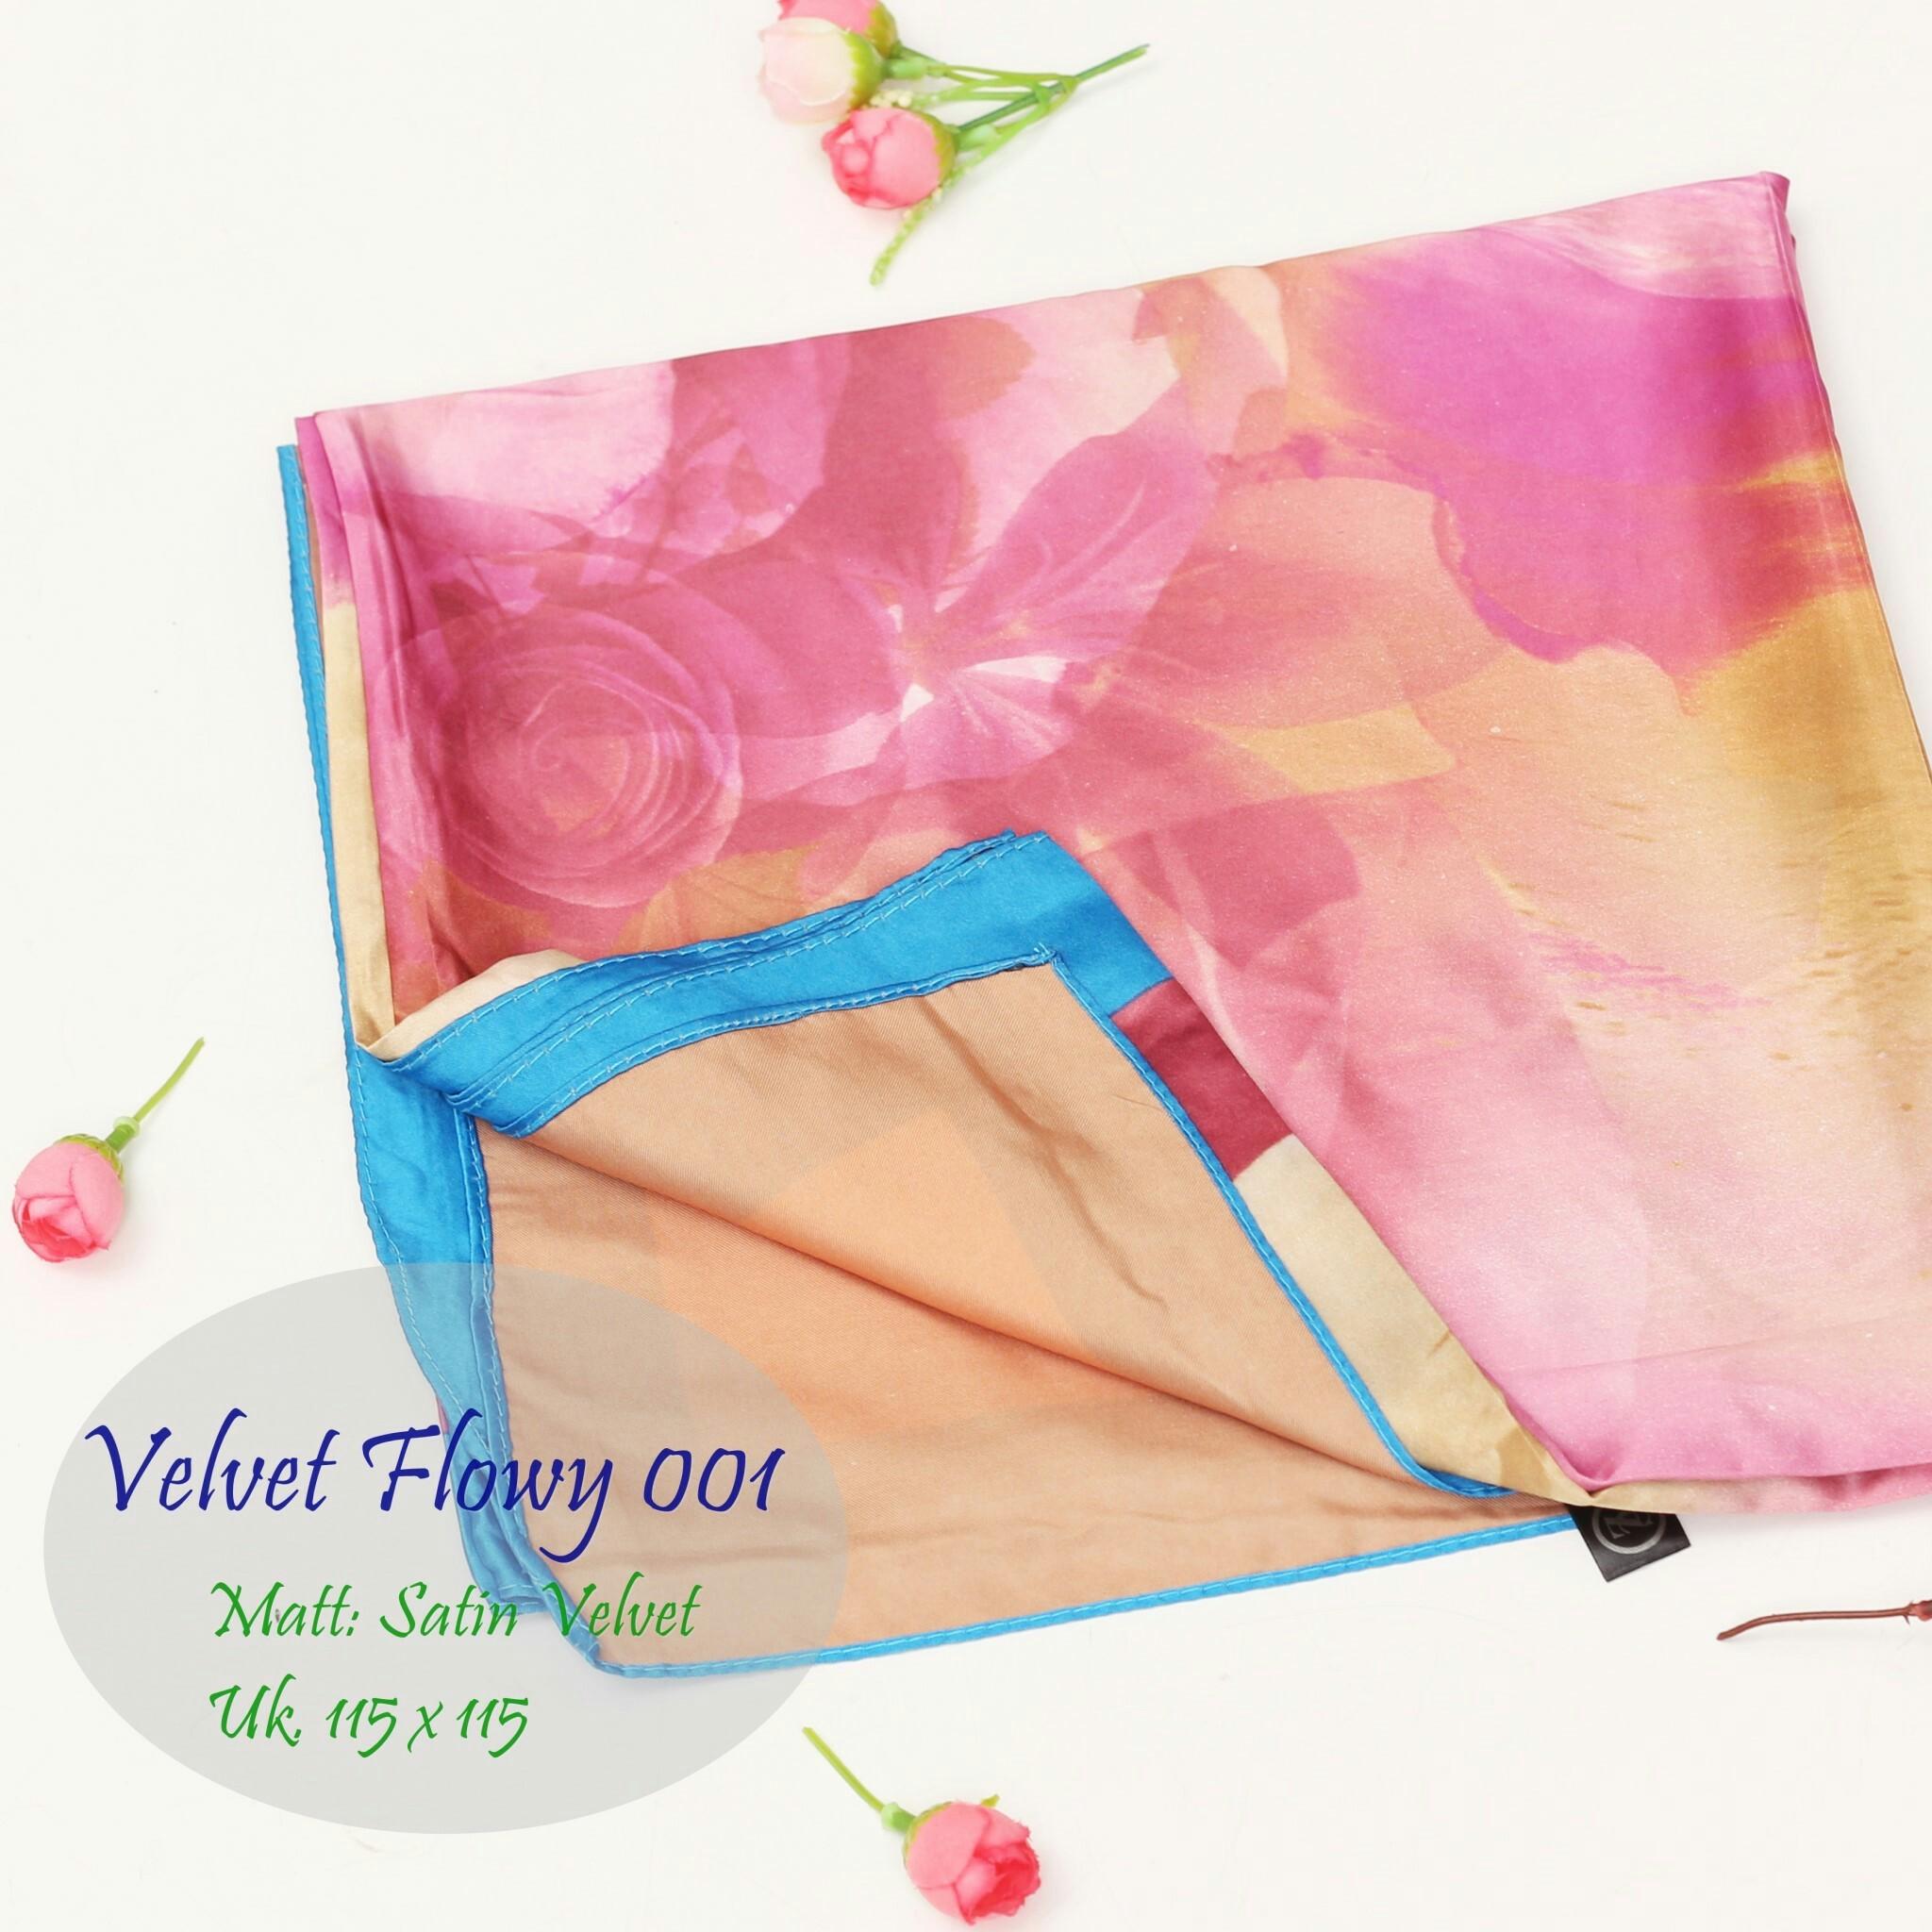 Grosir Kerudung | Pashmina Murah | Baju Murah : Velvet Flowy013